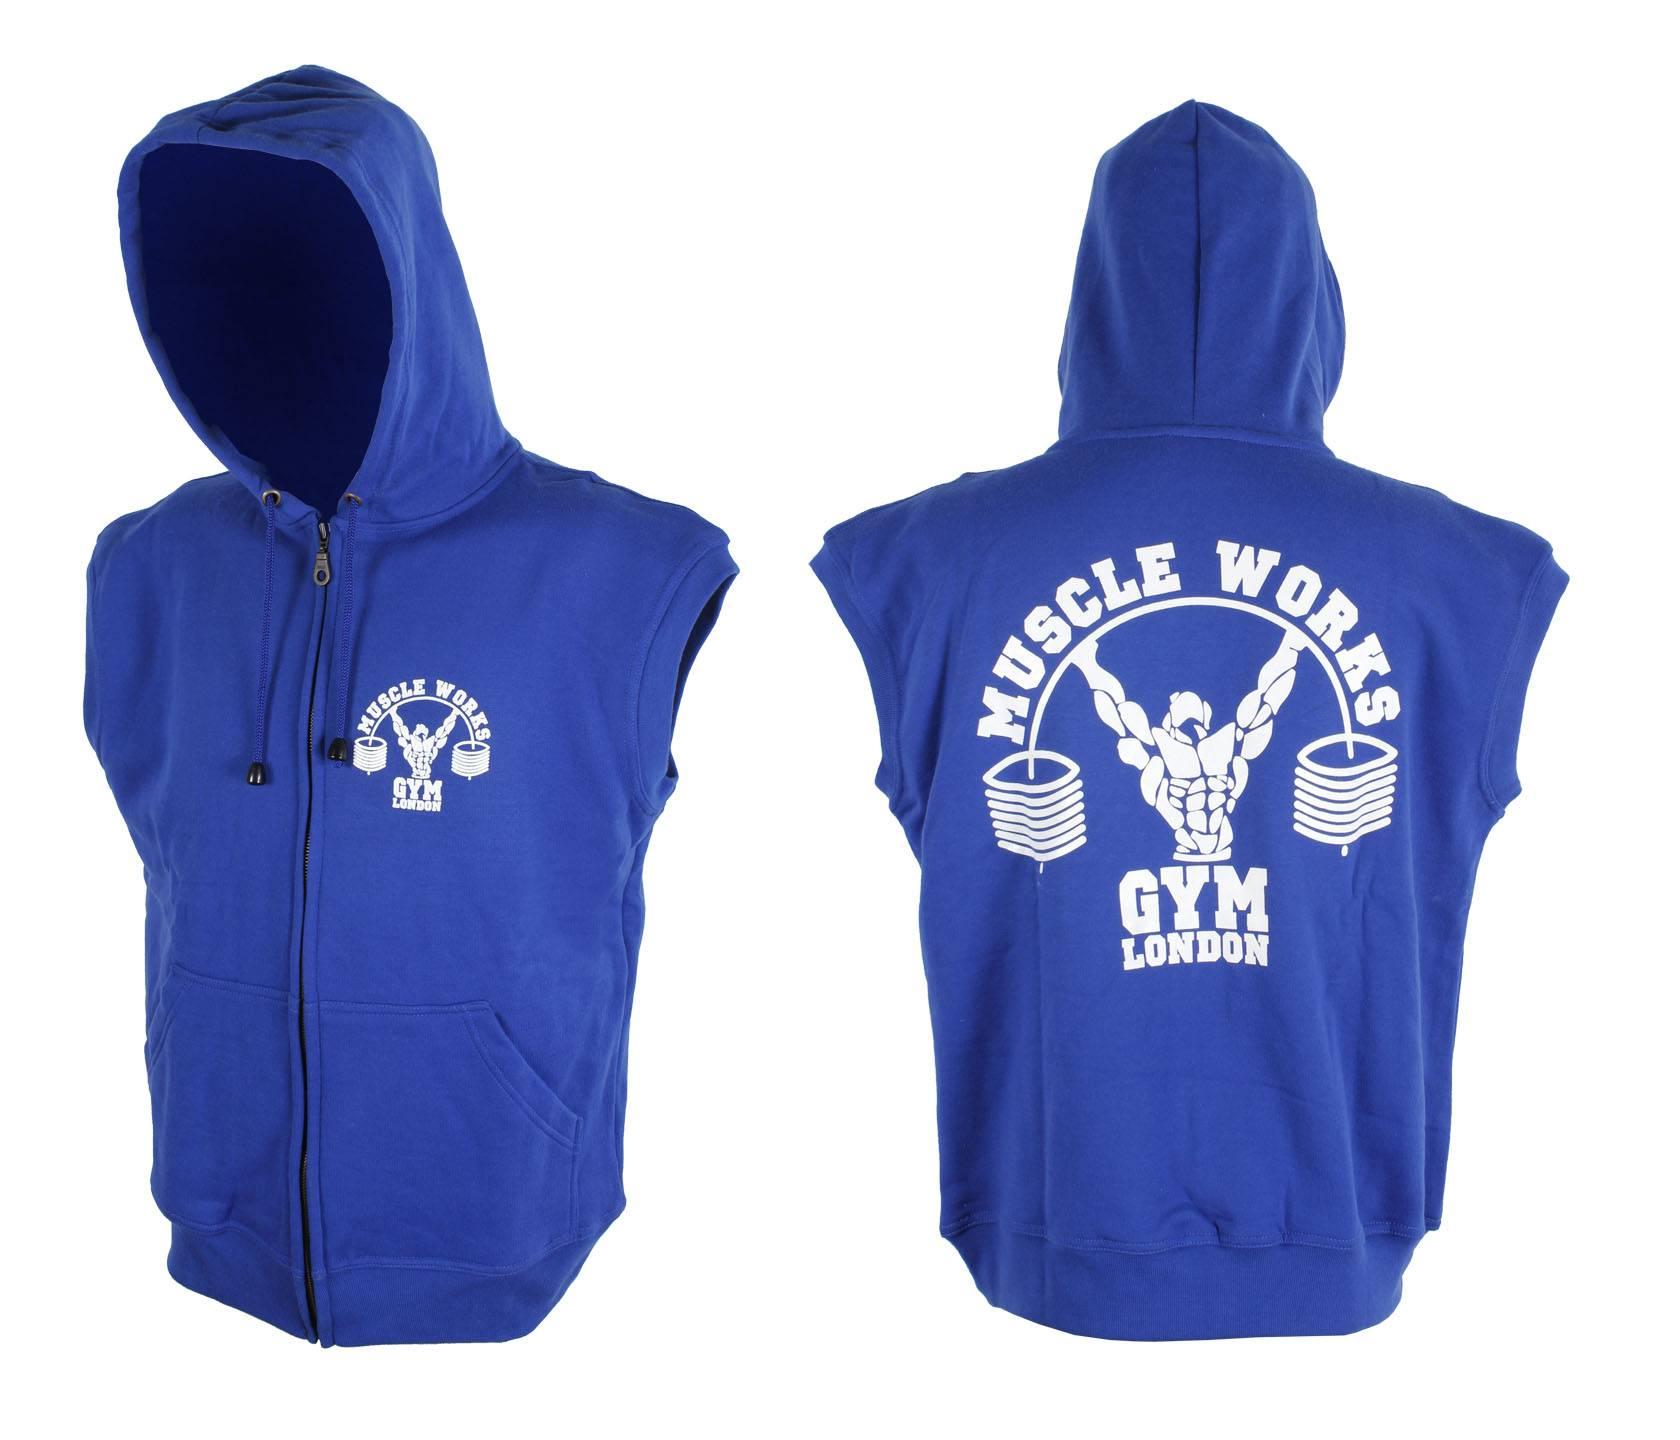 Customisible GYM Sleeveless Hooded Sweatshirts